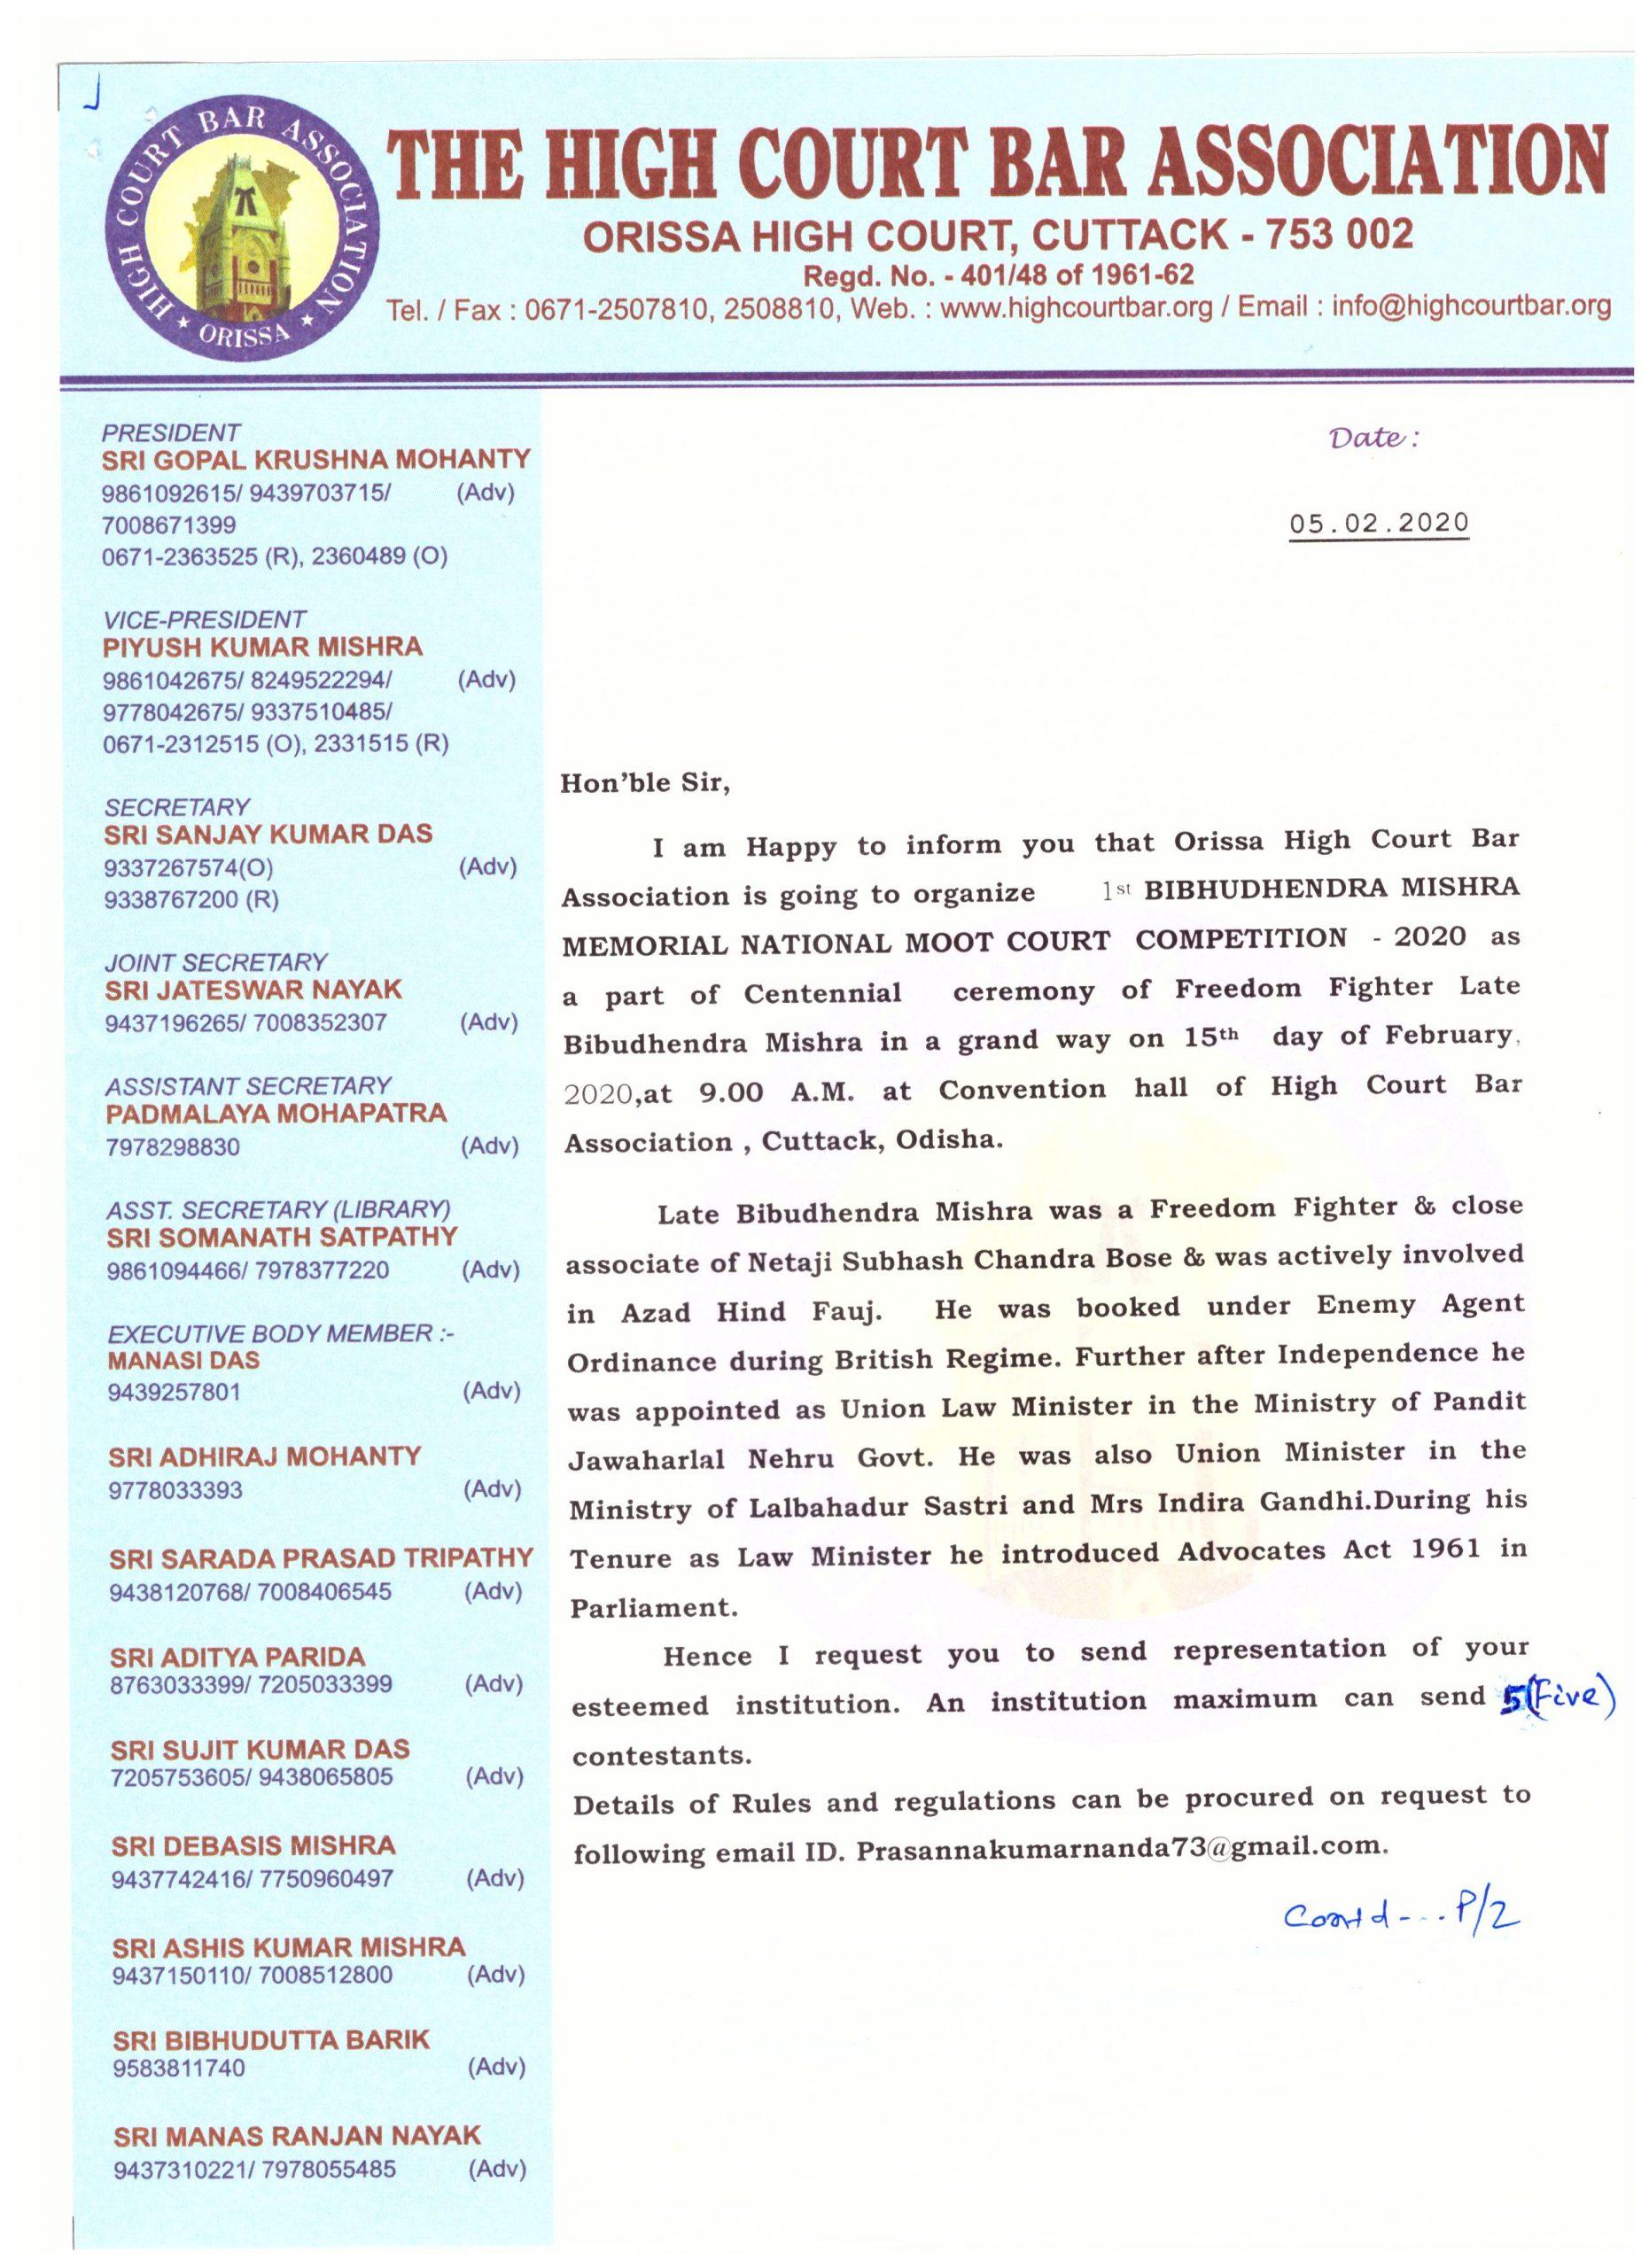 1st Bibhudhendra Mishra Memorial National Moot Court at High Court Bar Association, Odisha